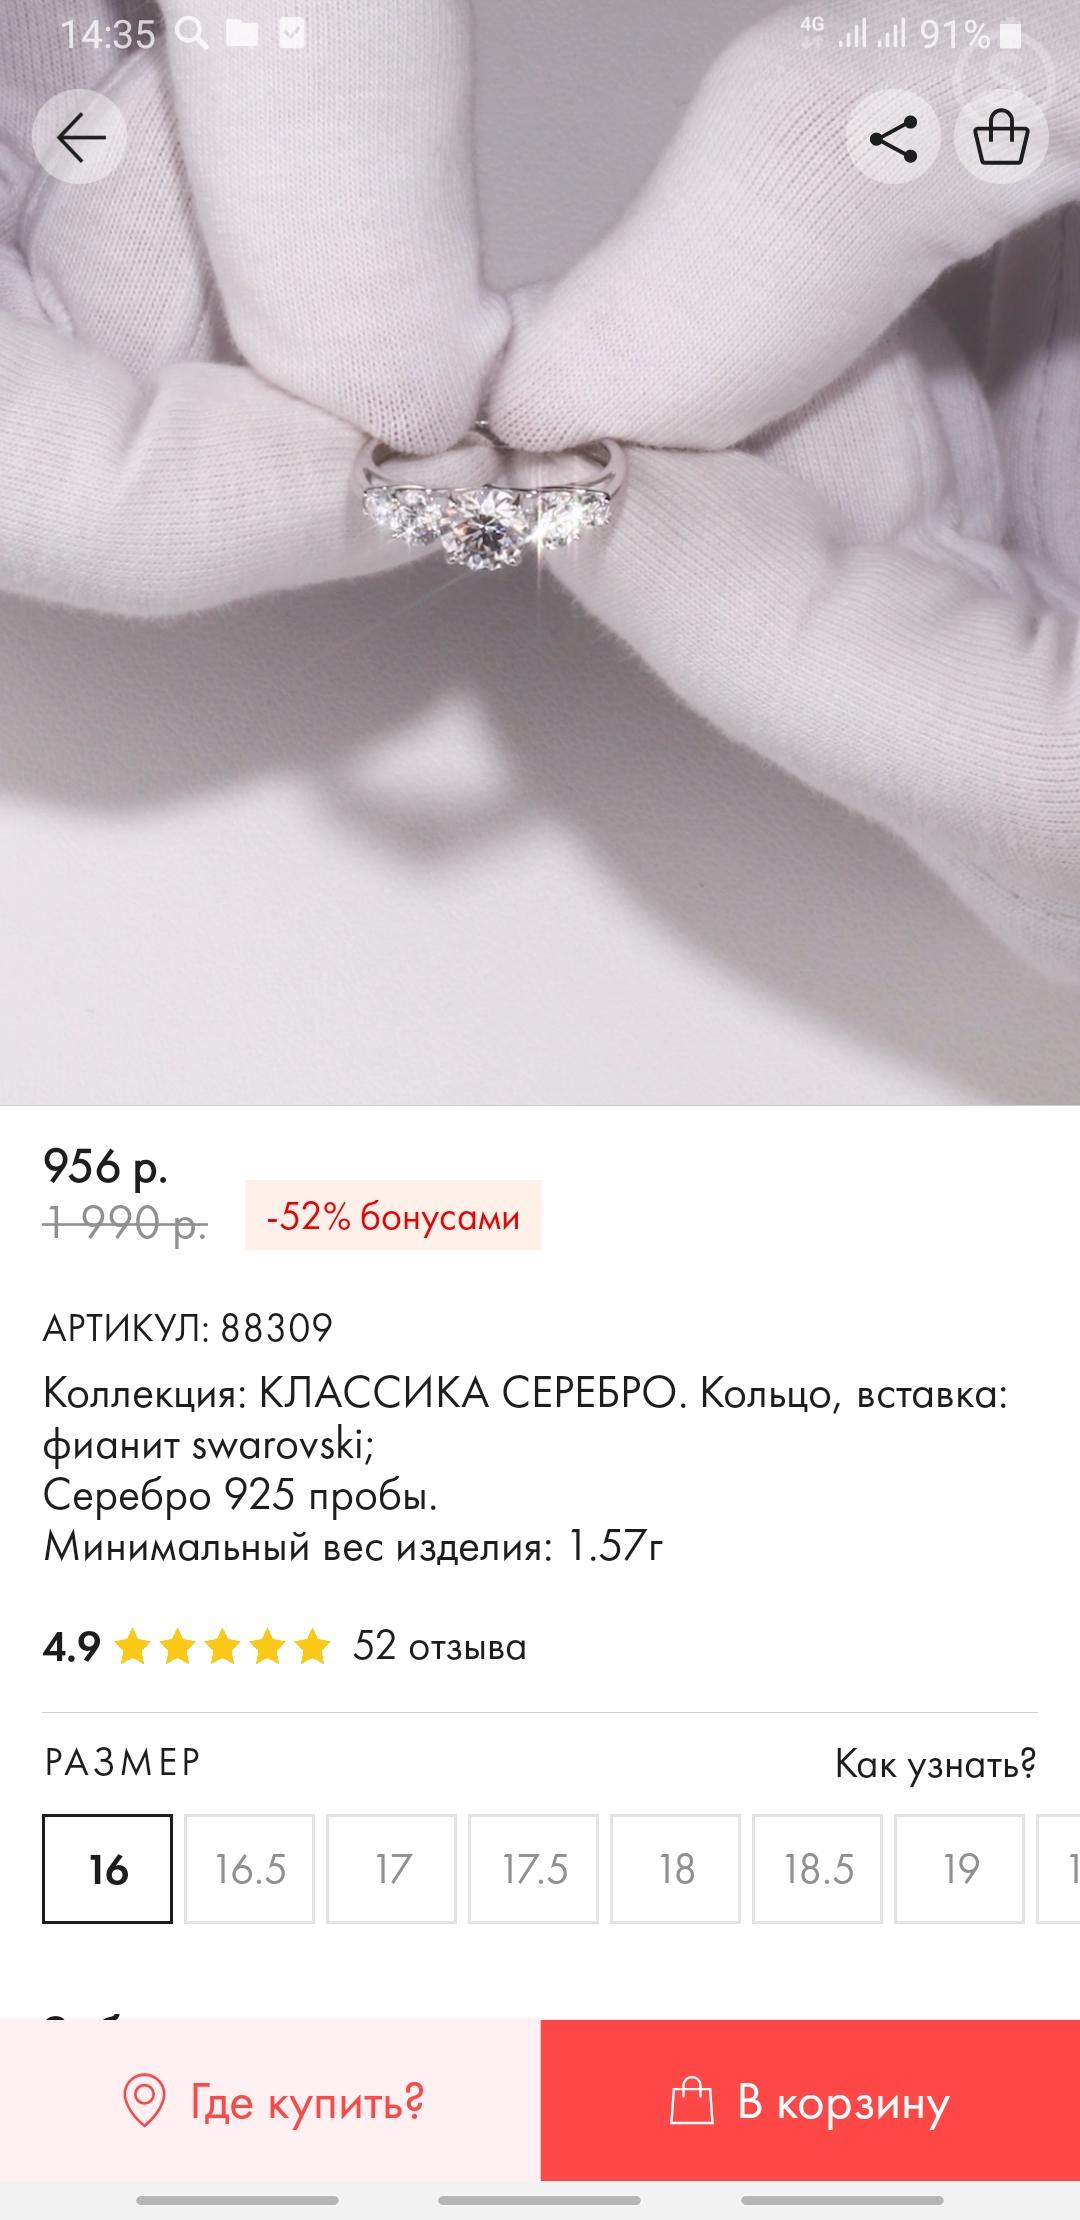 Супер колечко )))))))